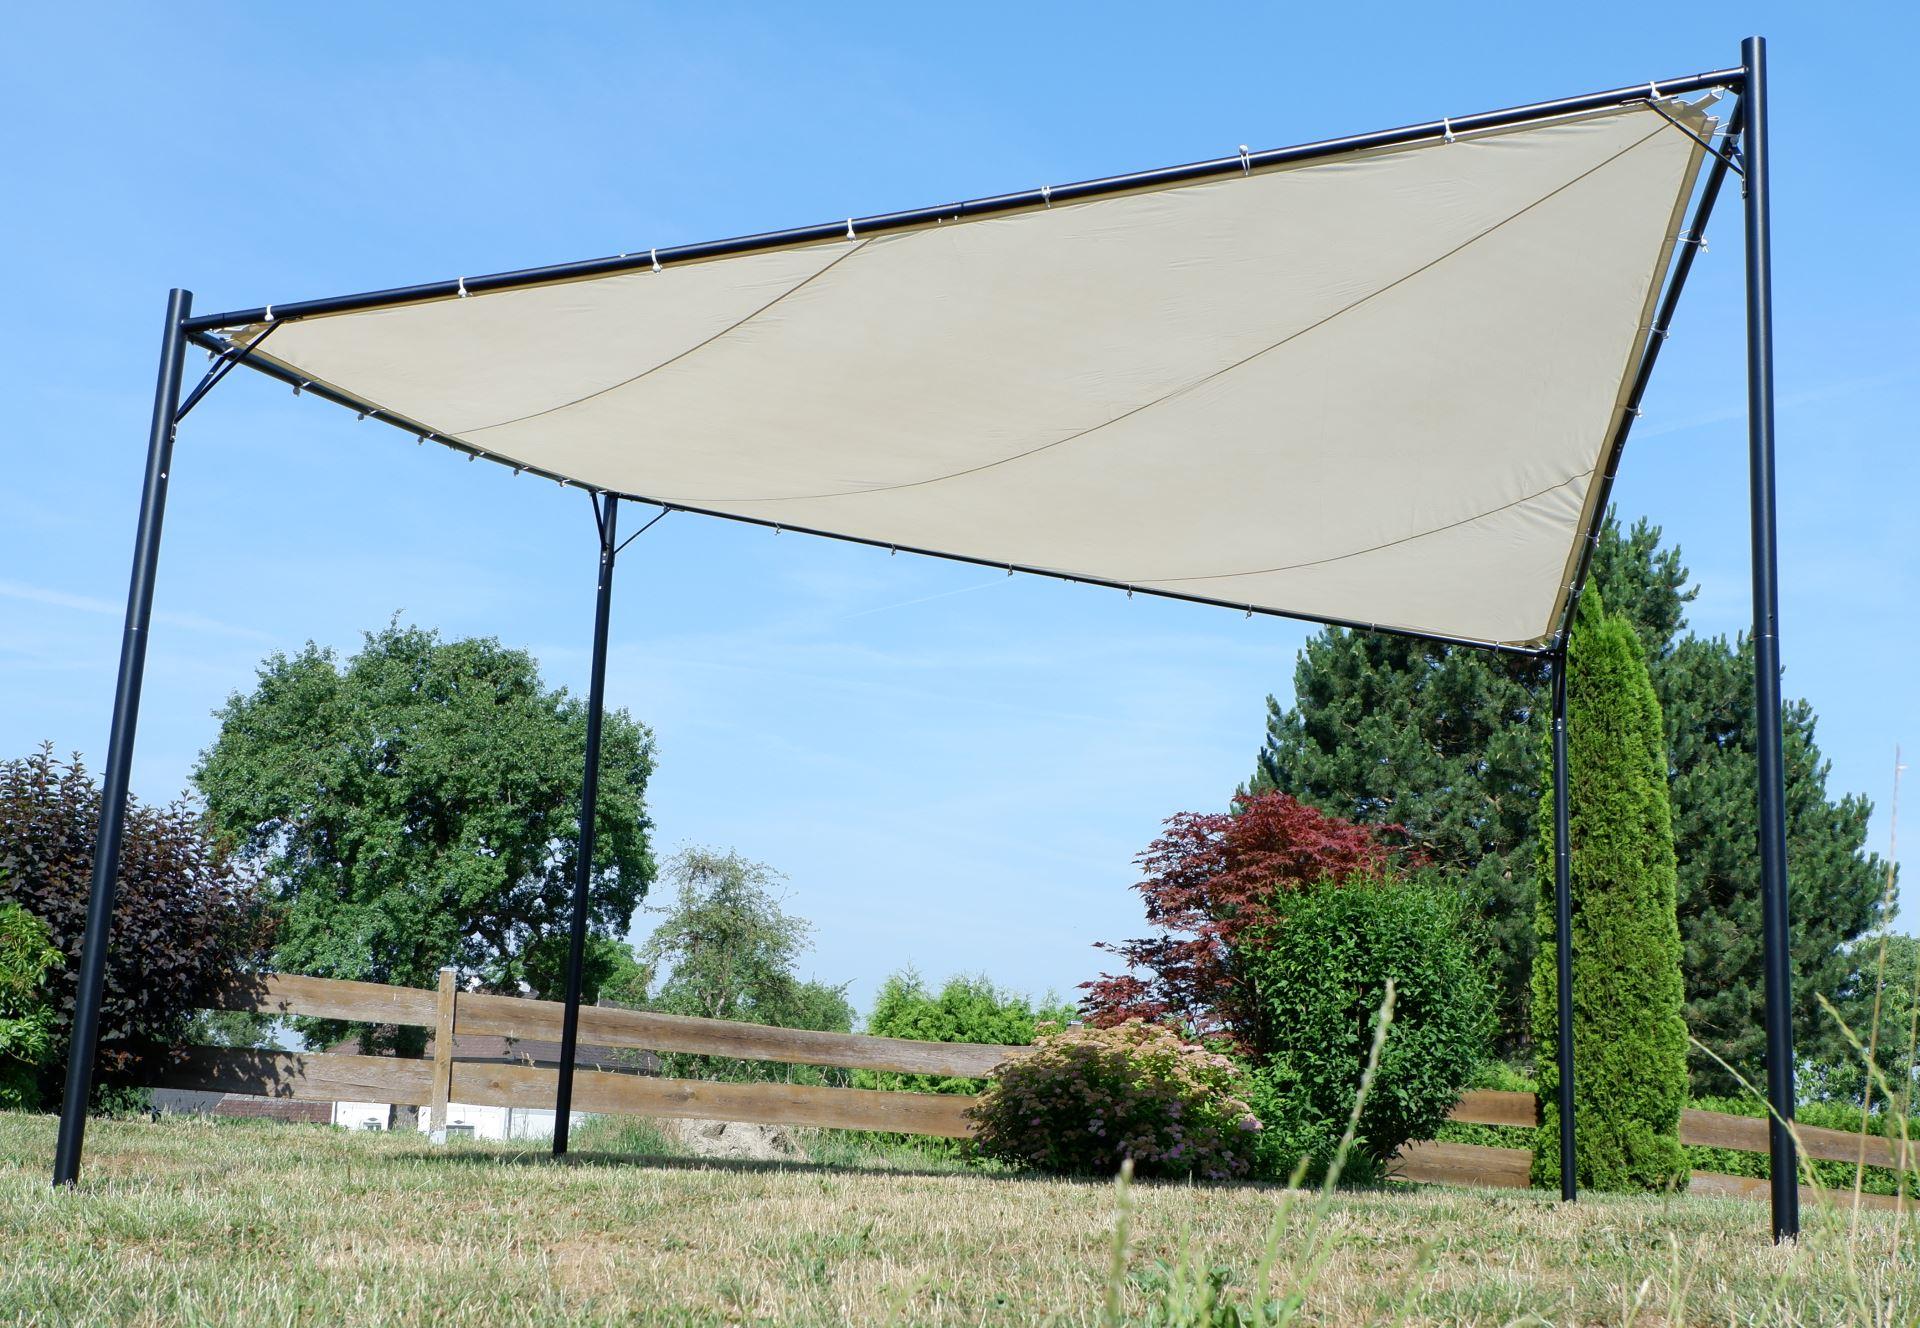 Eleganter Gartenpavillon Schmetterling Butterfly Pavillon Sonnensegel Sonnensegel Sonnensegel 4x4 Meter 16m² Dach, UV30+ Modell  PAROS e5f508